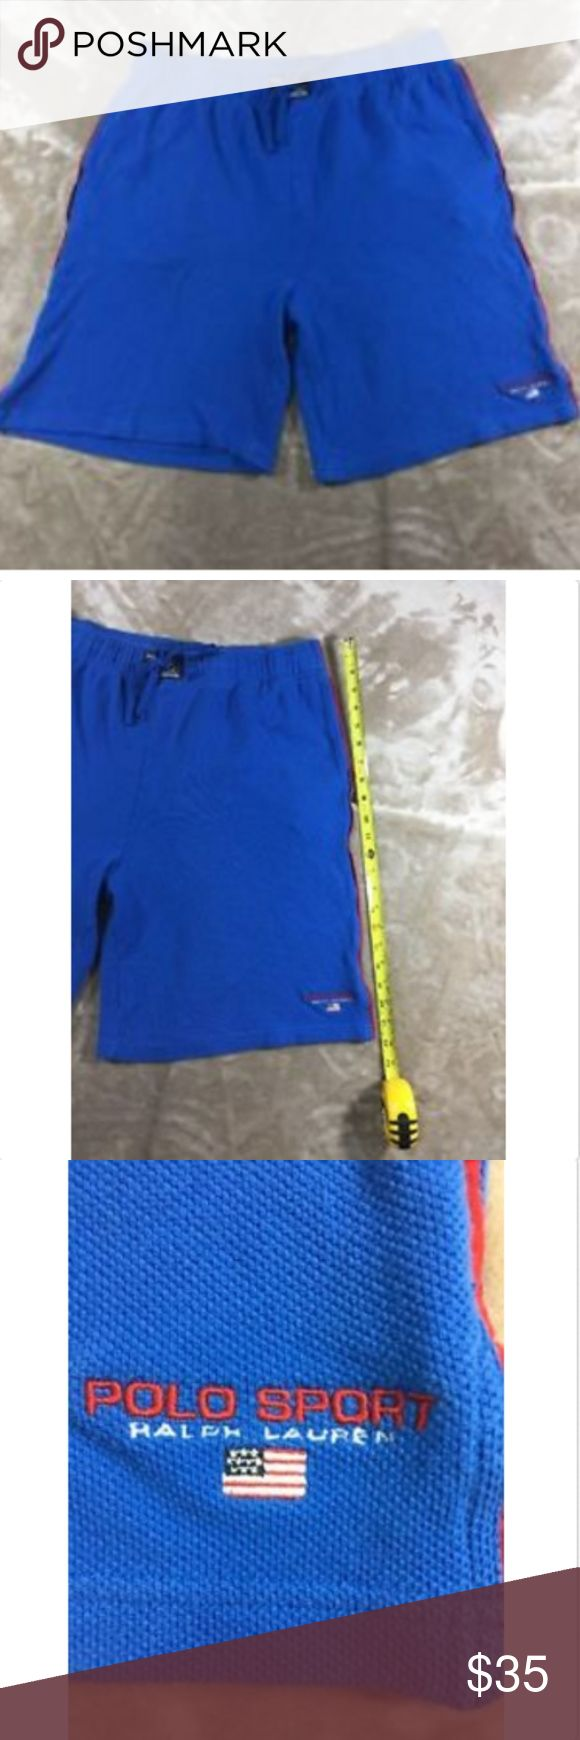 Vintage DeadStock Polo Sport Ralph Lauren shorts Vintage DeadStock Polo Sport Ralph Lauren Men`s Size XL Blue Beach Shorts - G Polo by Ralph Lauren Shorts Flat Front